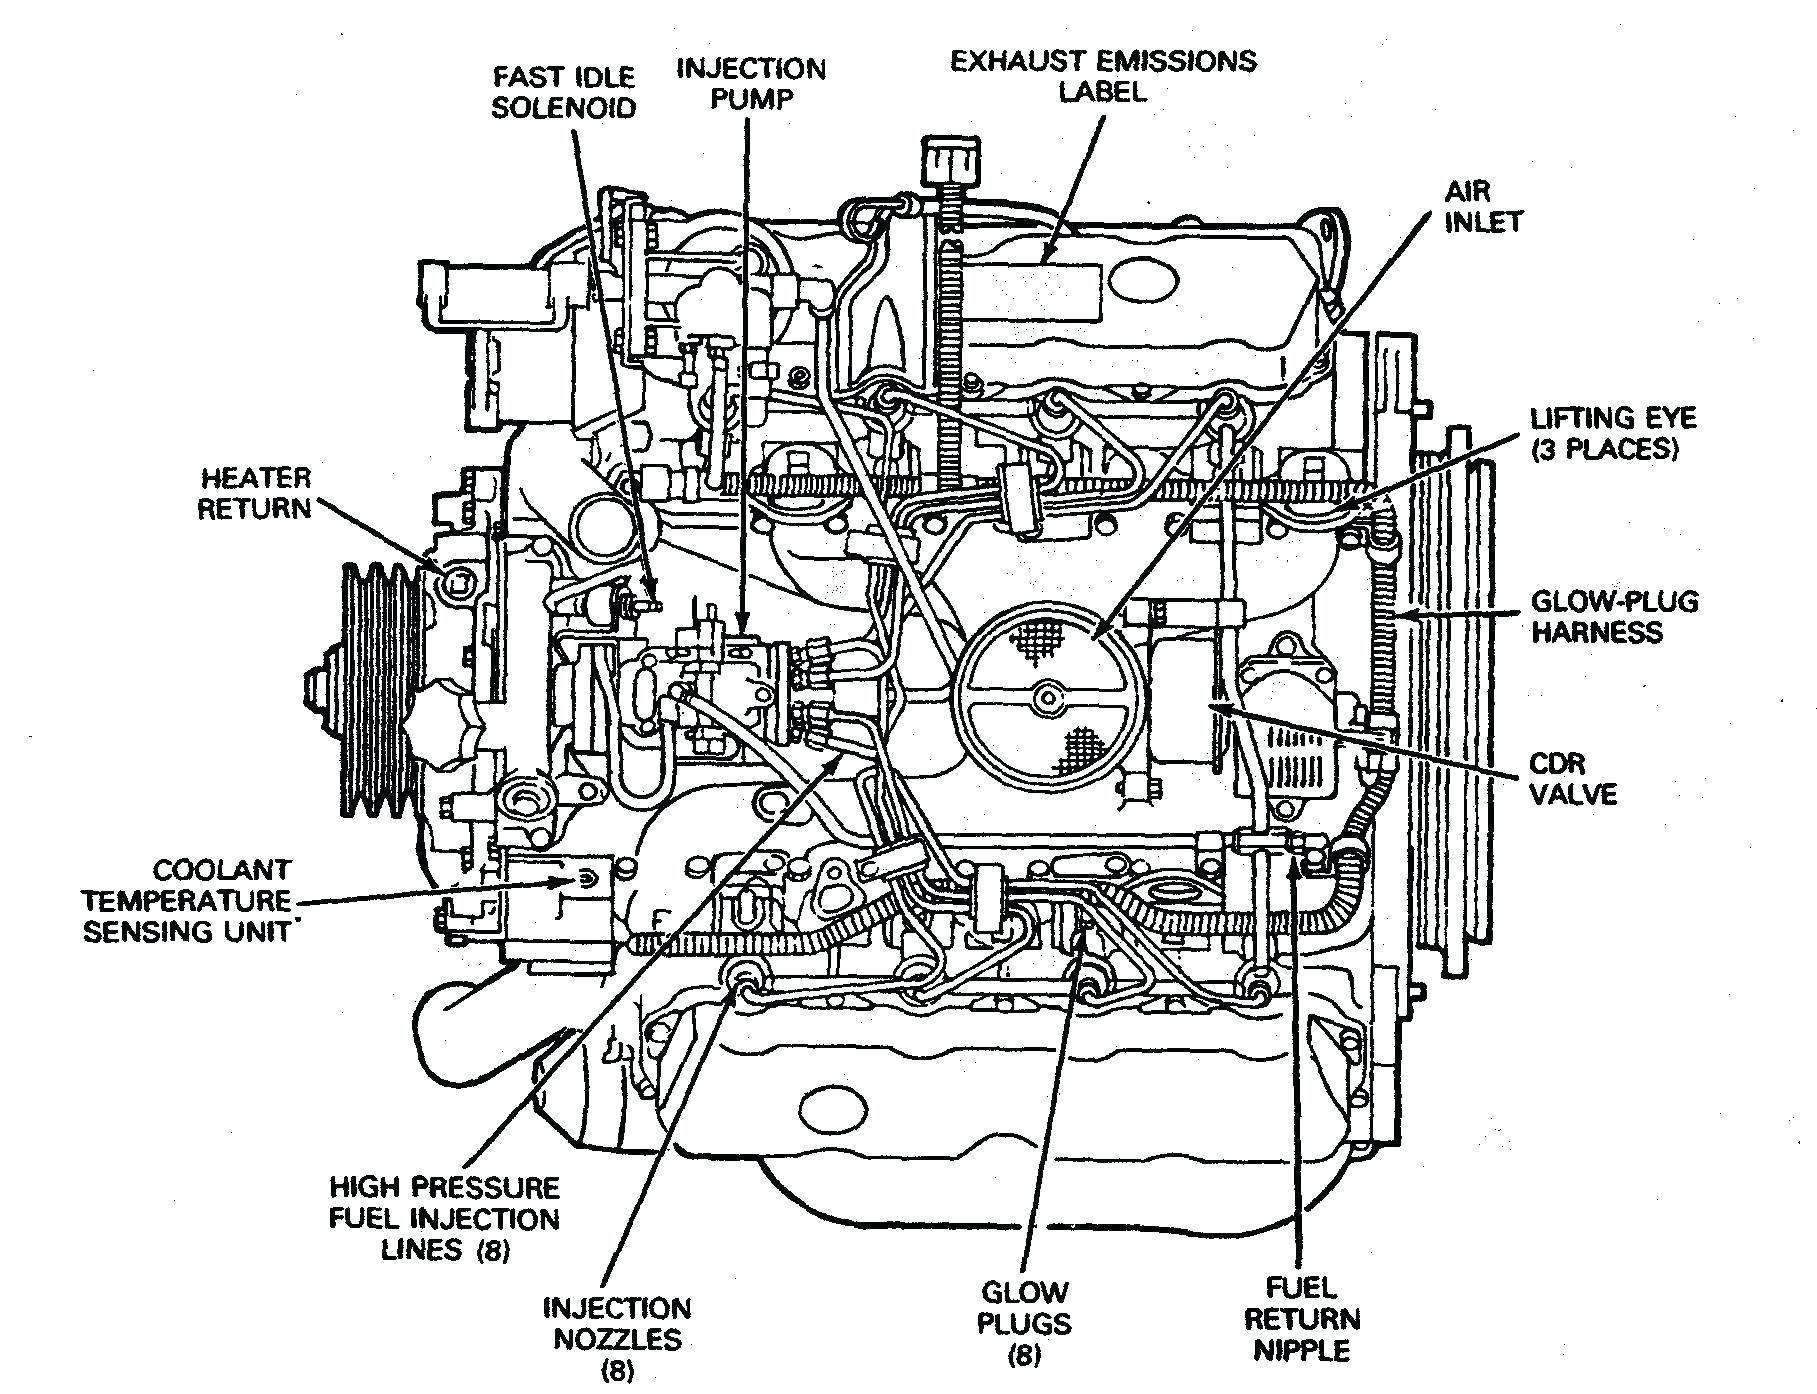 1995 ford Explorer Engine Diagram Kawasaki Engine Parts Diagram Delighted Inspiration Of 1995 ford Explorer Engine Diagram